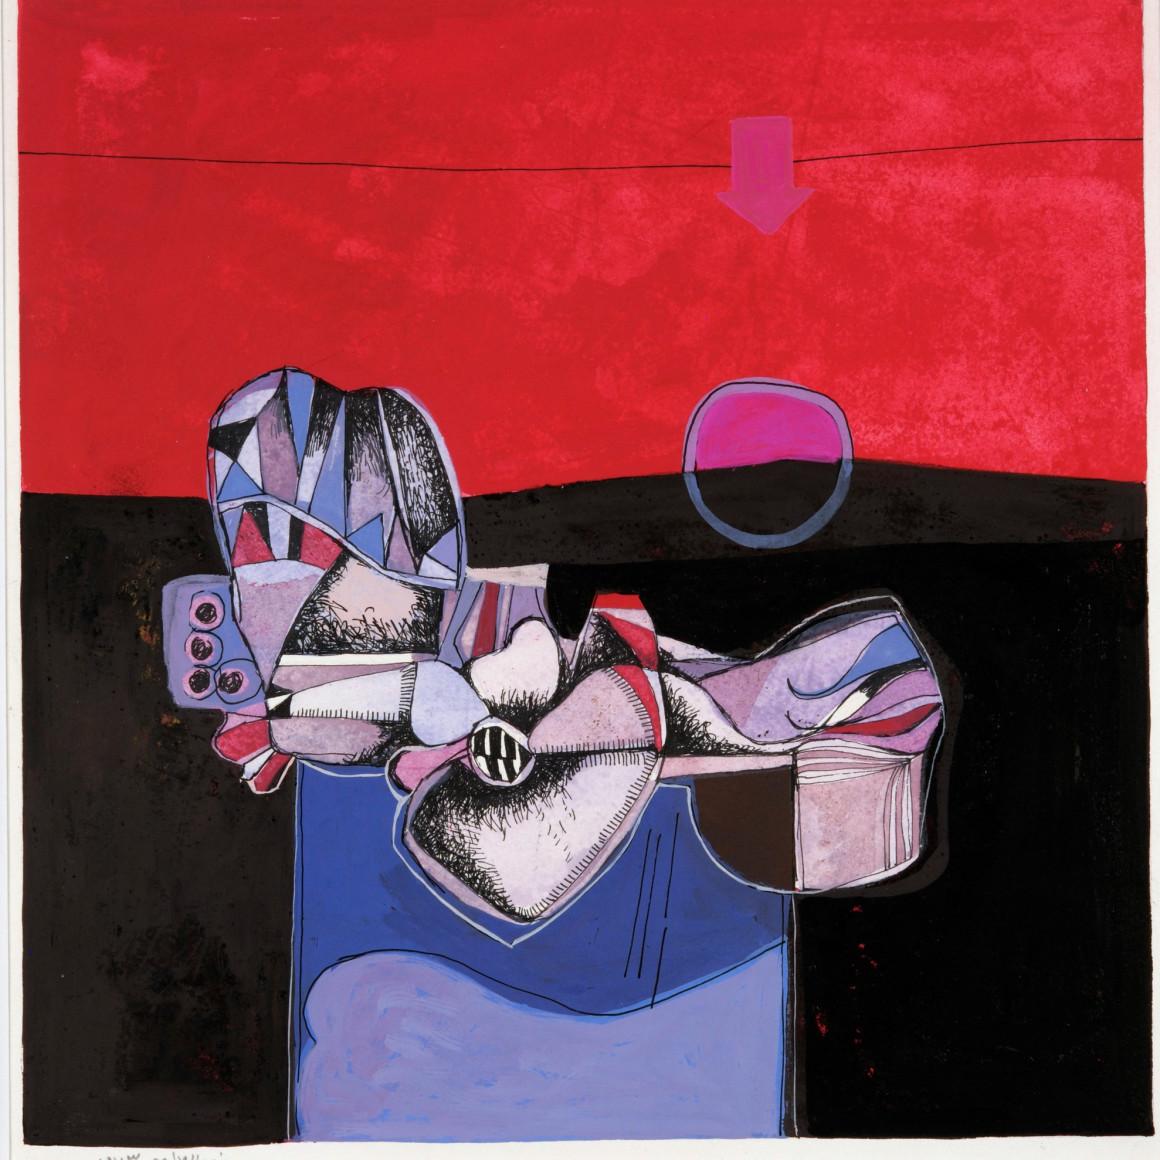 Dia al-Azzawi, Untitled, 1973